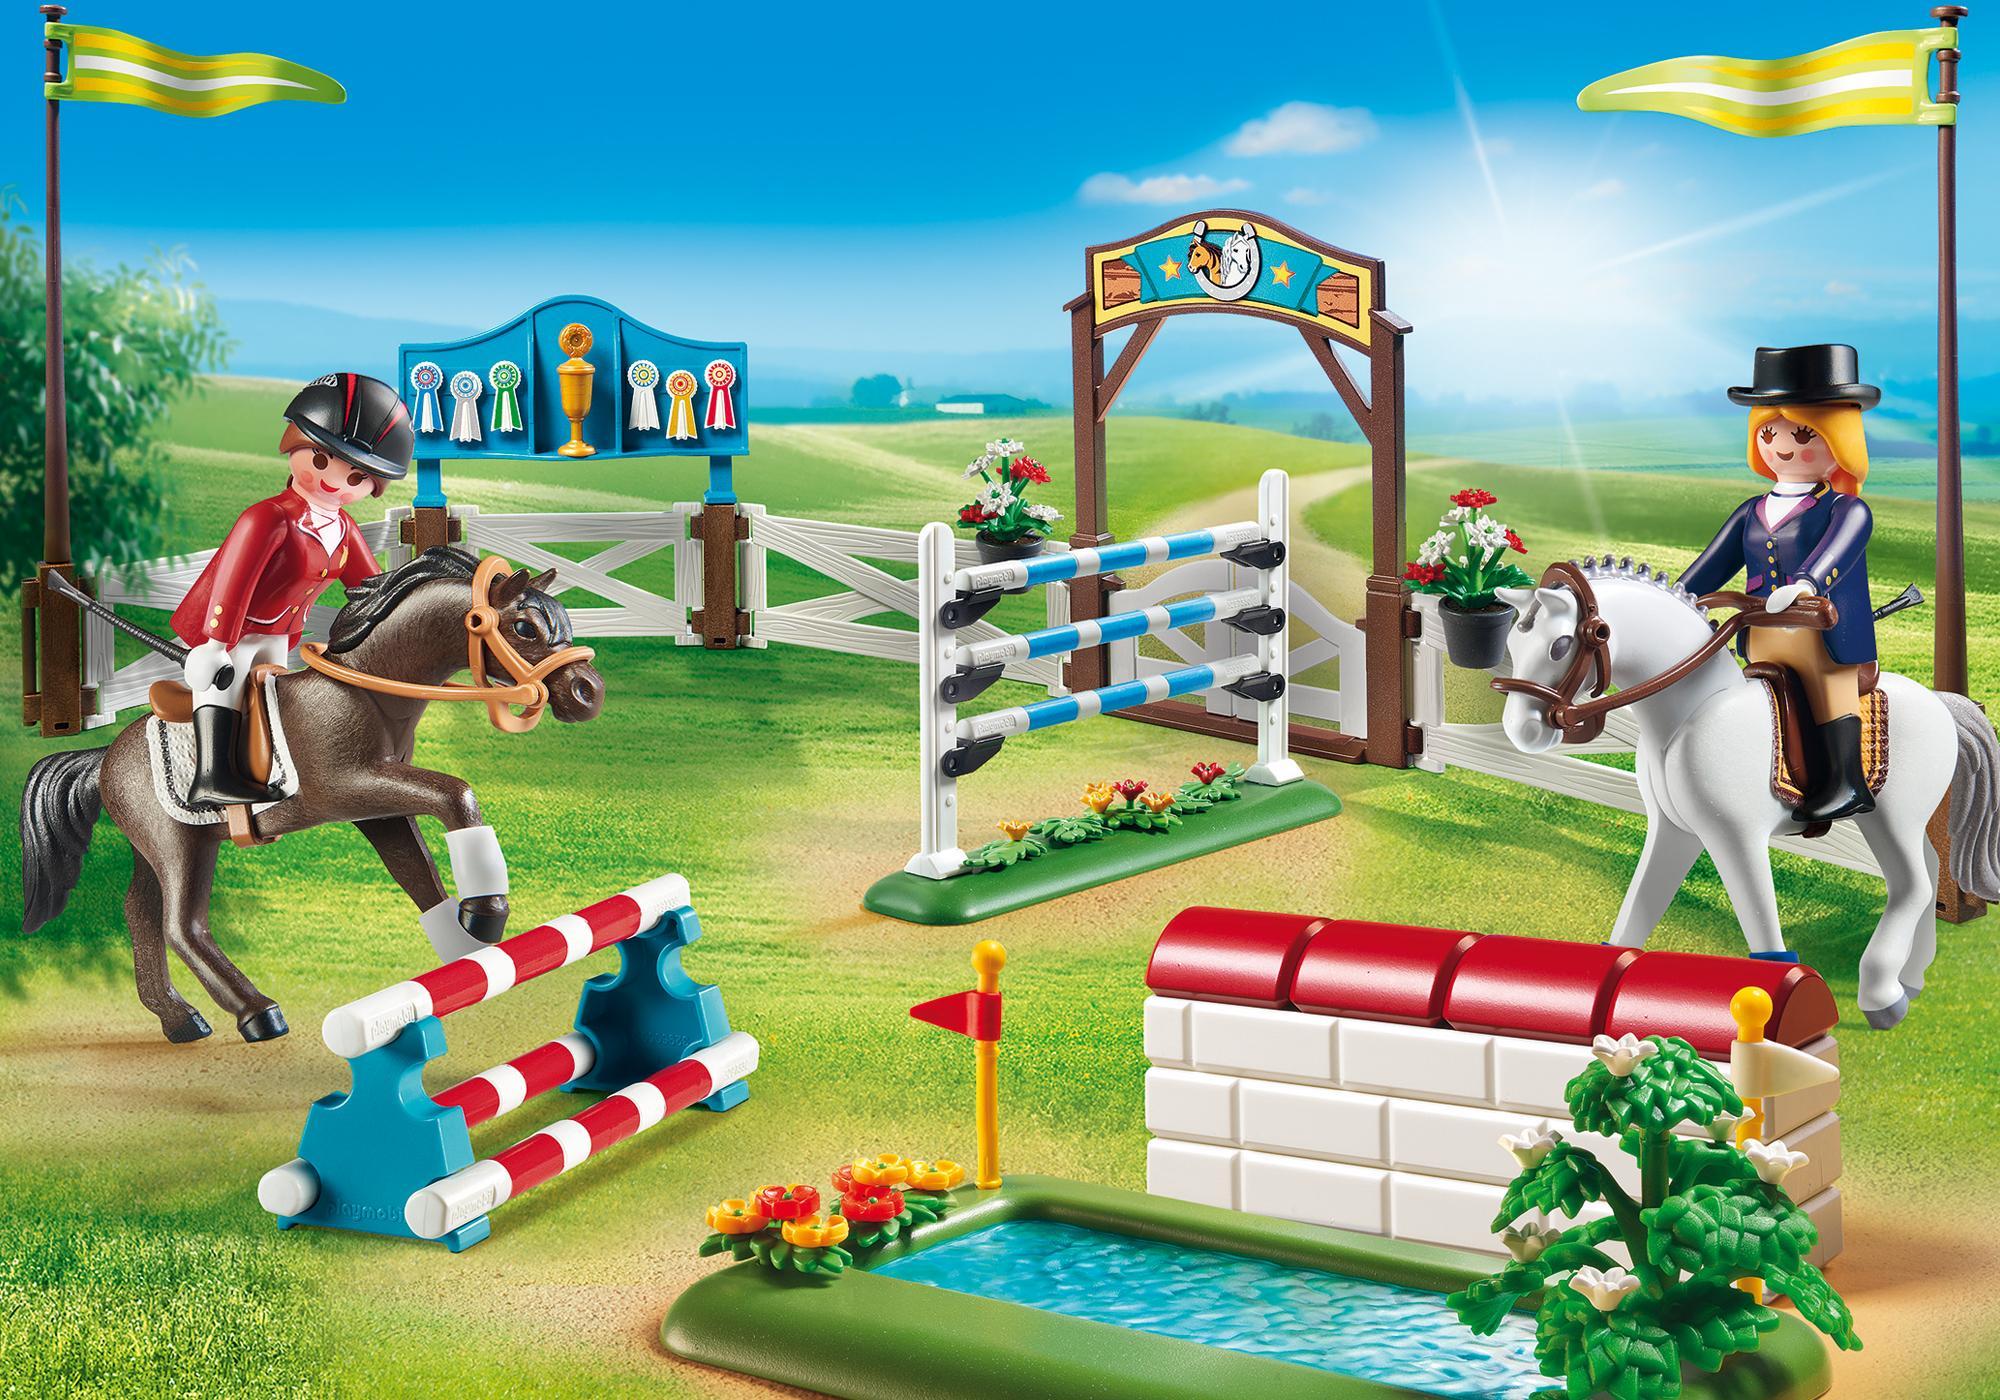 http://media.playmobil.com/i/playmobil/6930_product_detail/Horse Show